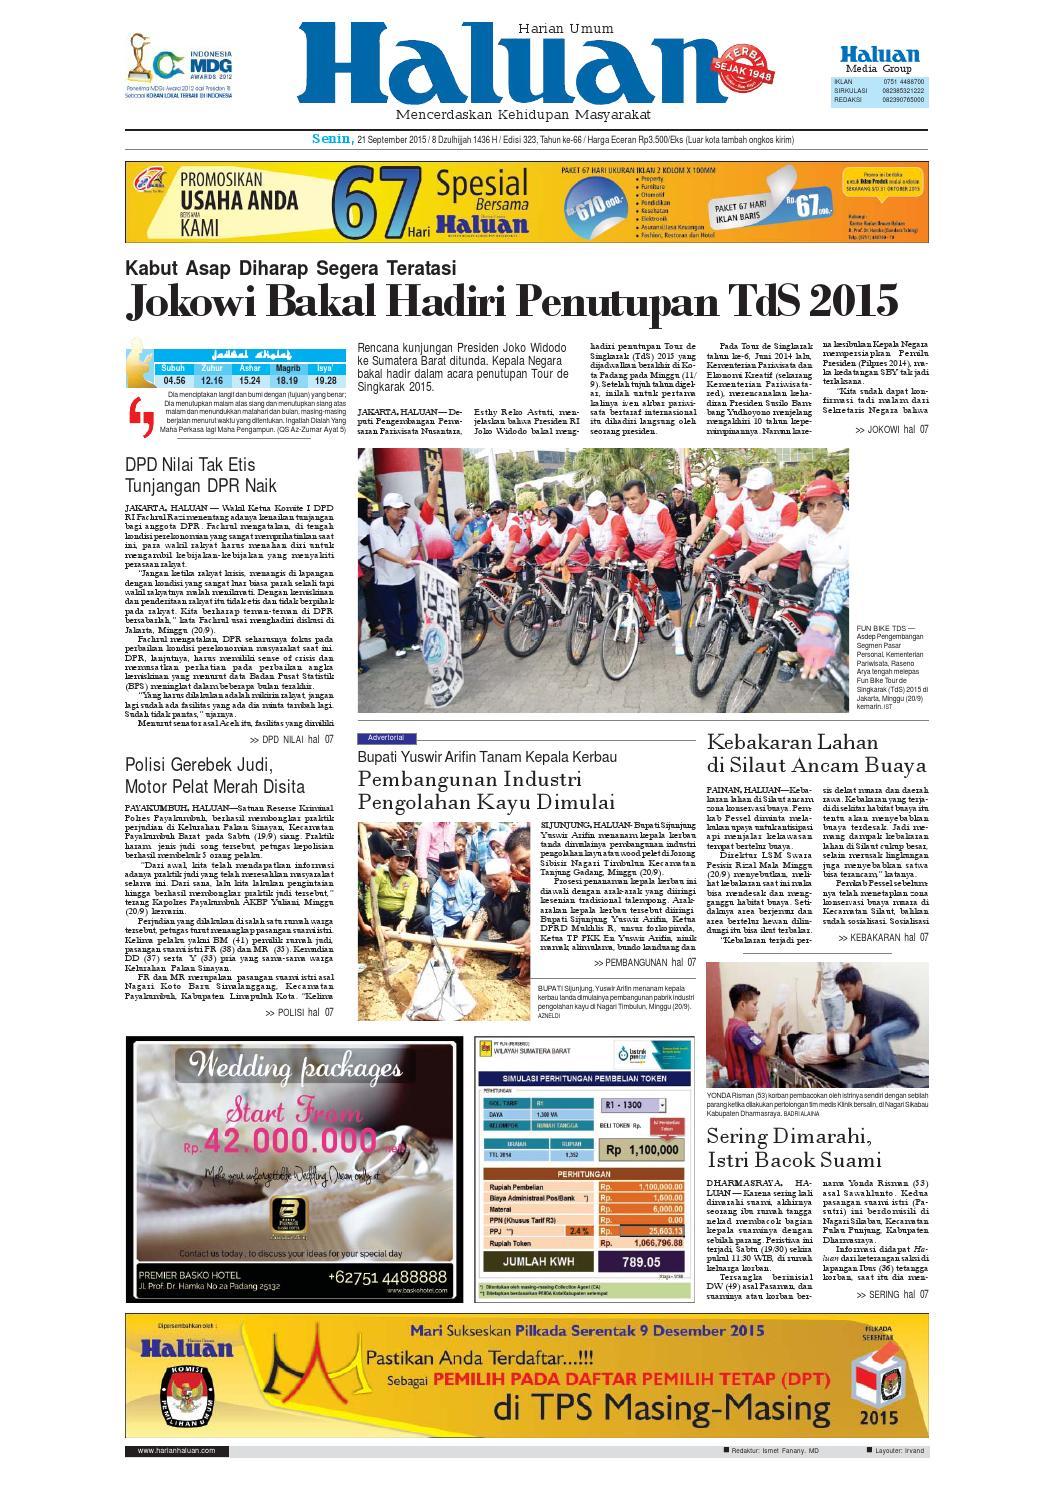 Haluan 21 September 2015 By Harian Issuu Bri Produk Ukm Bumn Kain Doby Motif Bunga